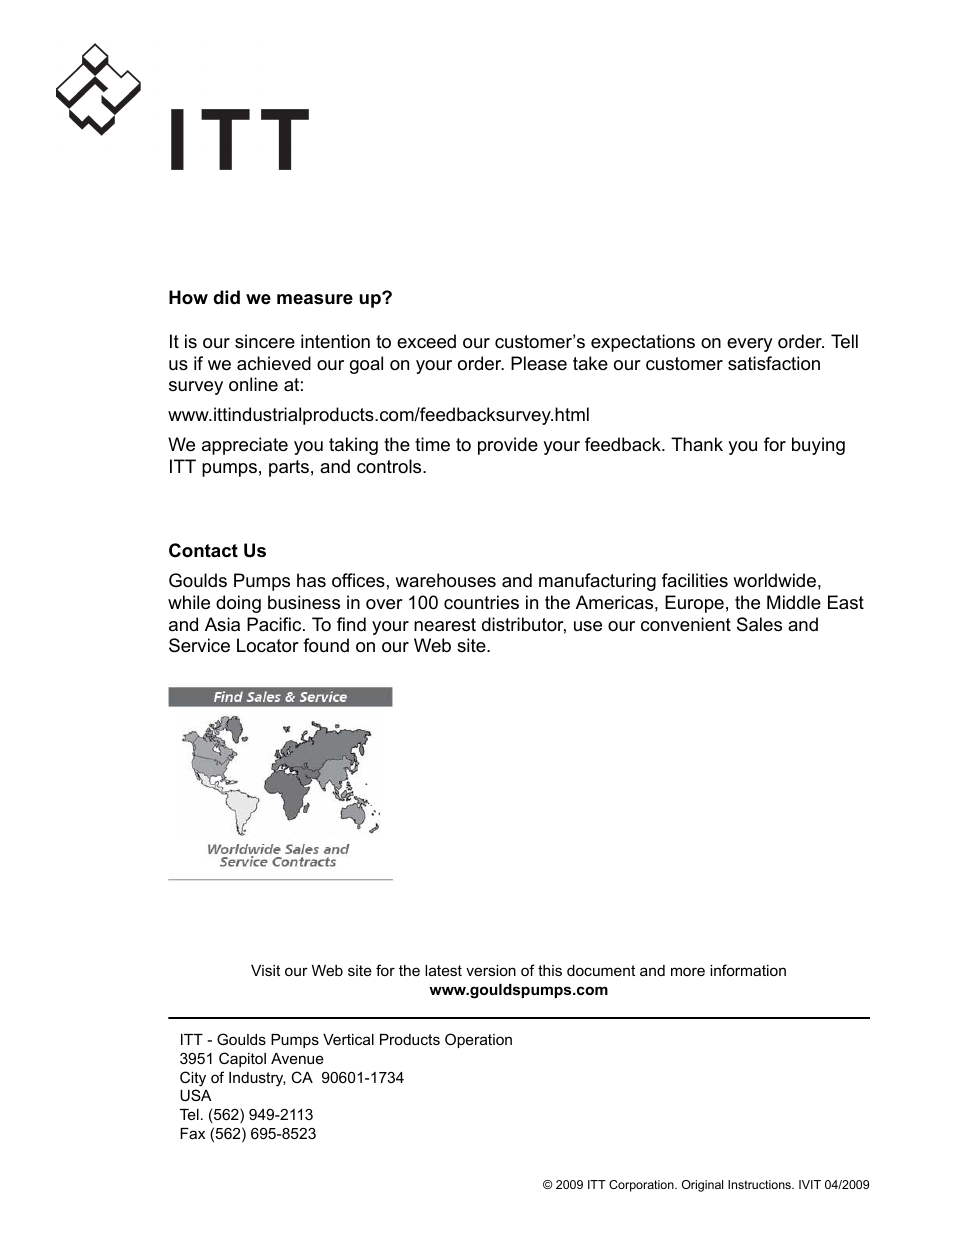 Itt user manual user guide manual that easy to read goulds pumps vit iom user manual page 78 78 original mode rh manualsdir com manuals in pdf instruction manual book fandeluxe Gallery